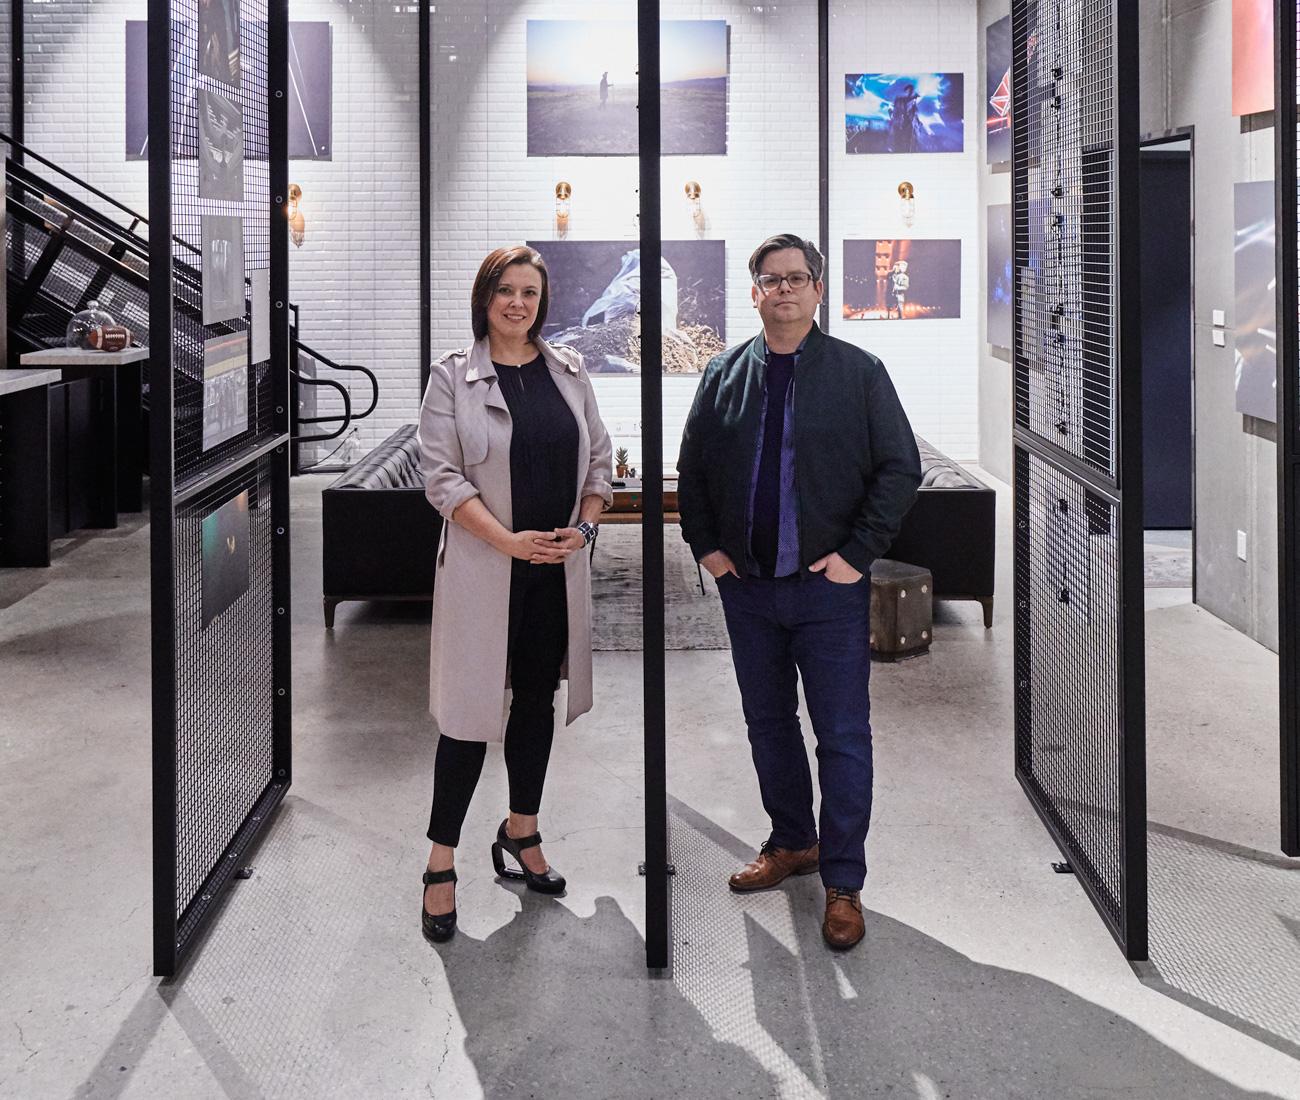 L&B principals Natasha Lebel and Luc Bouliane at the OneMethod office space.